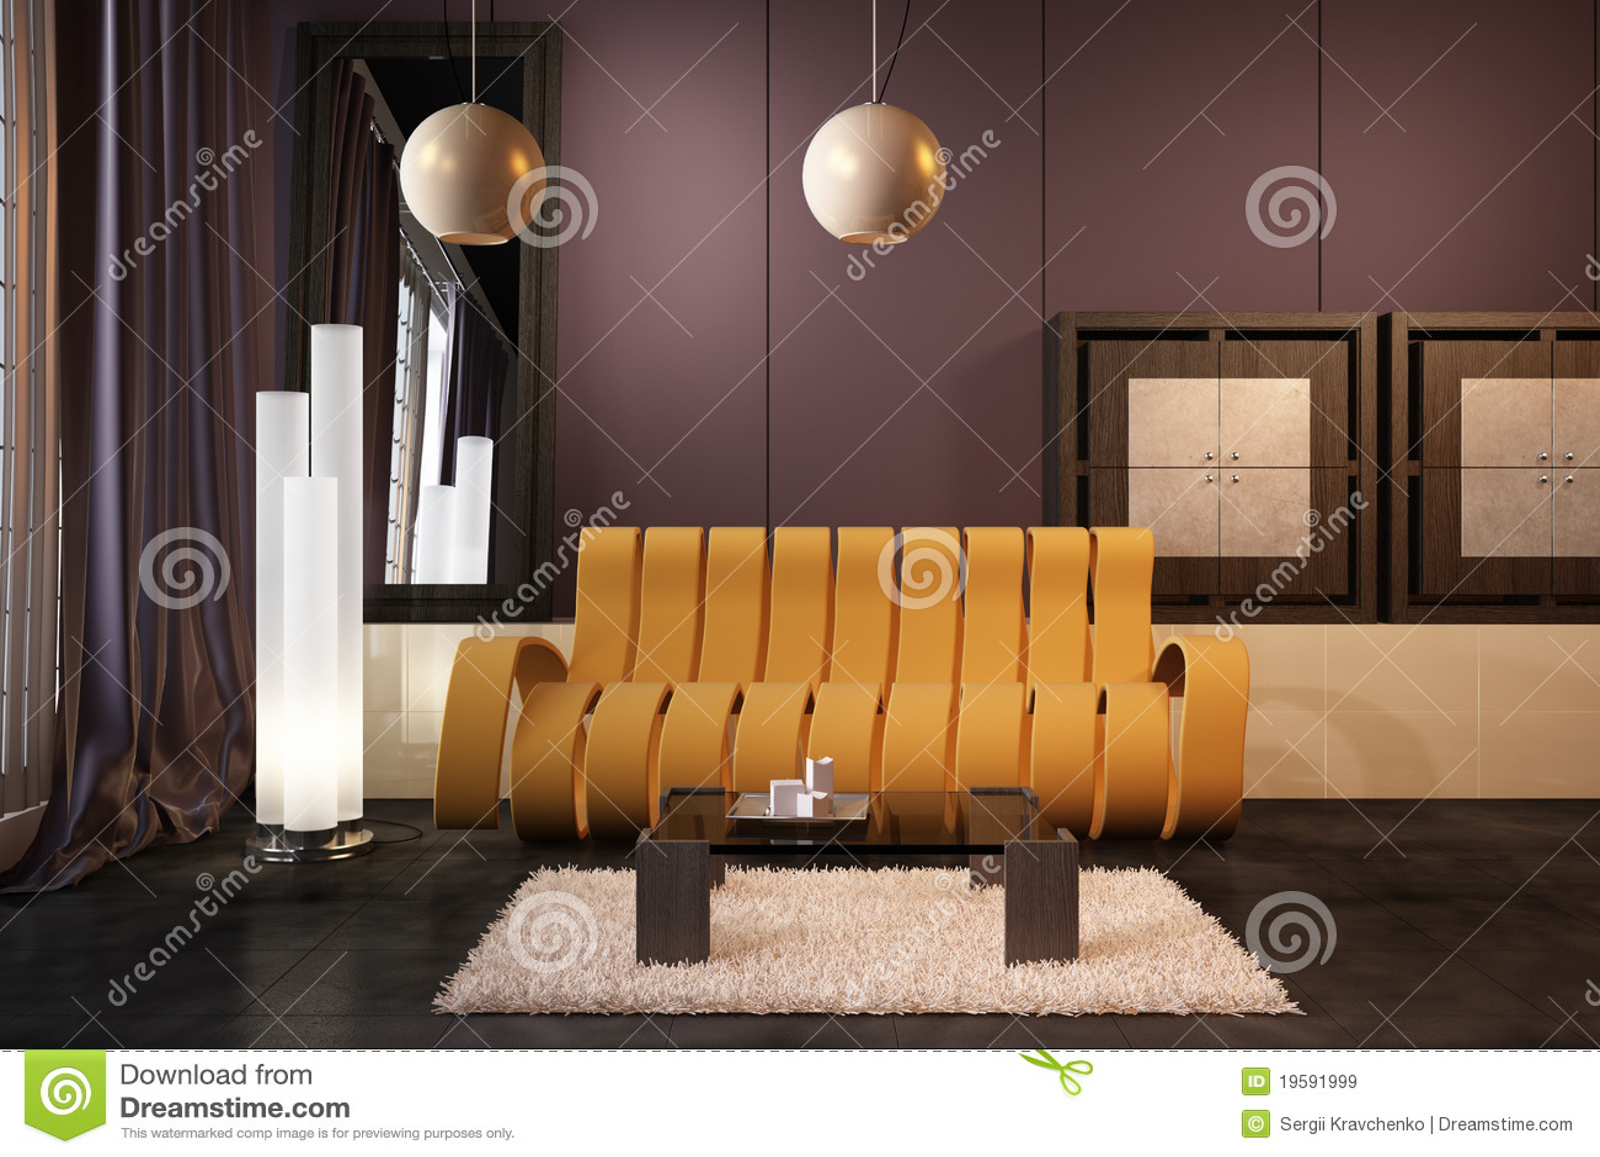 High resolution 3d render interior stock illustration for High resolution interior images